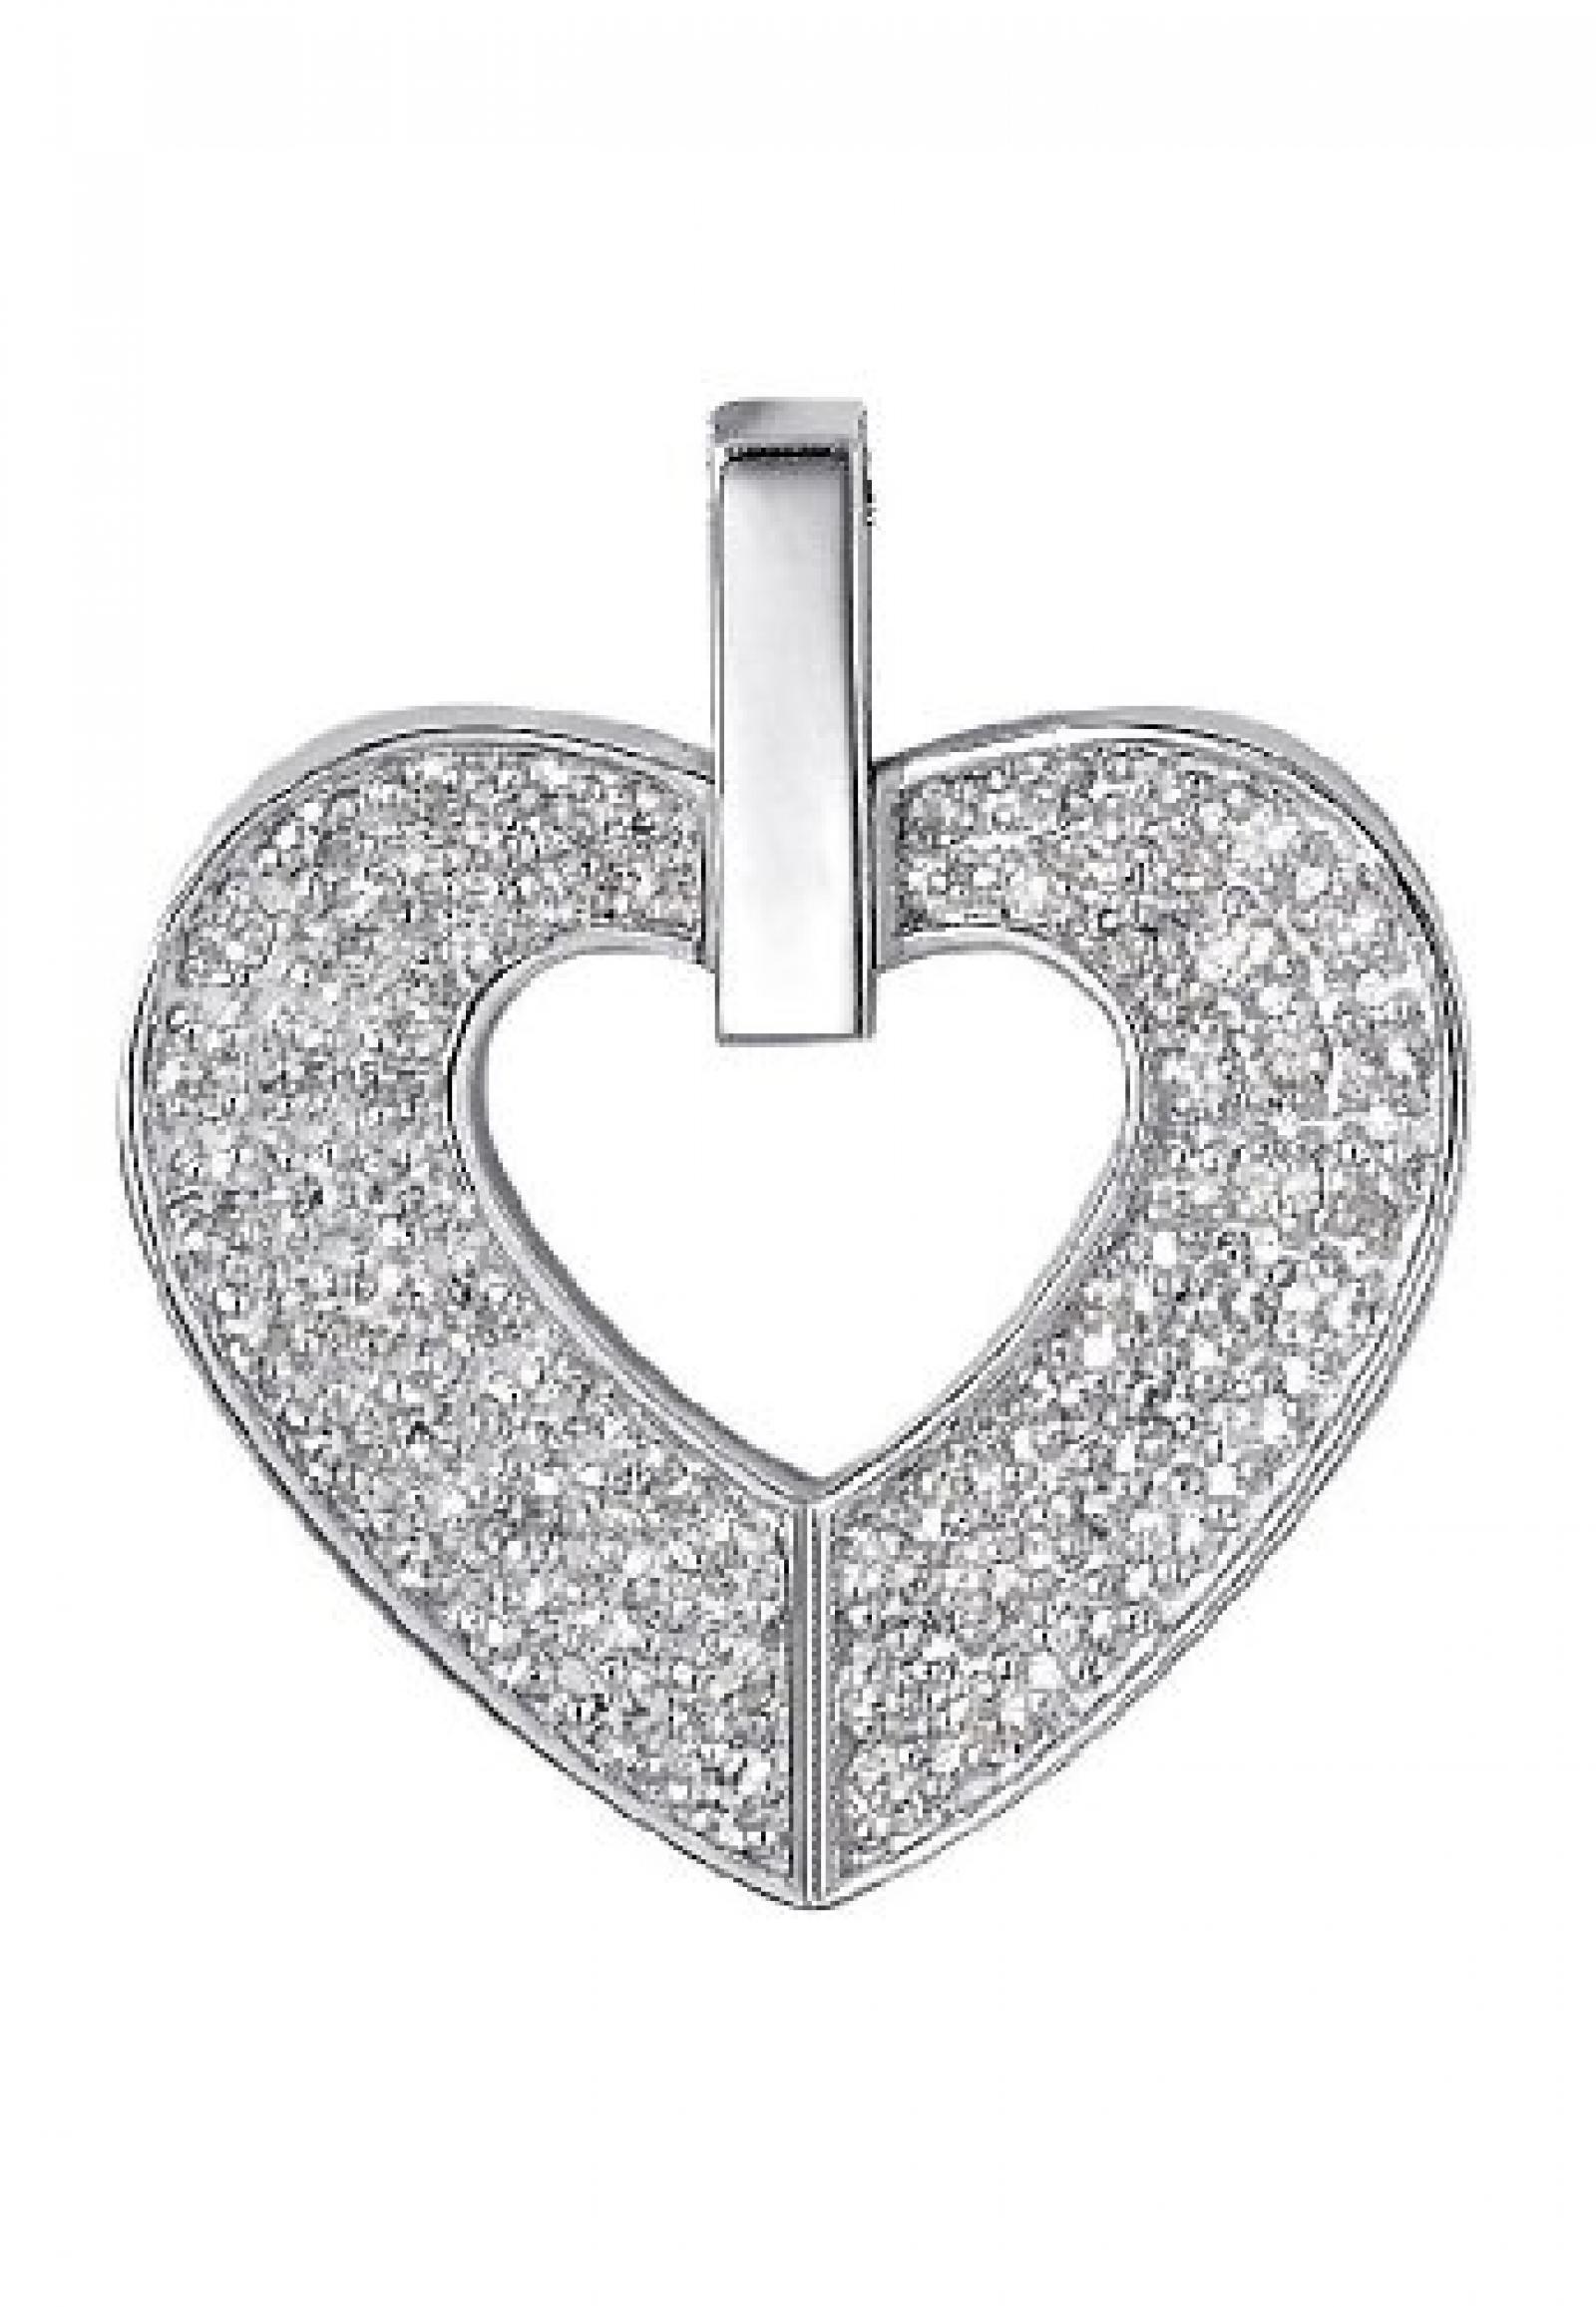 JETTE Charms Damen-Anhänger Jette Herzanhänger 925er Silber 64 Zirkonia One Size, silber